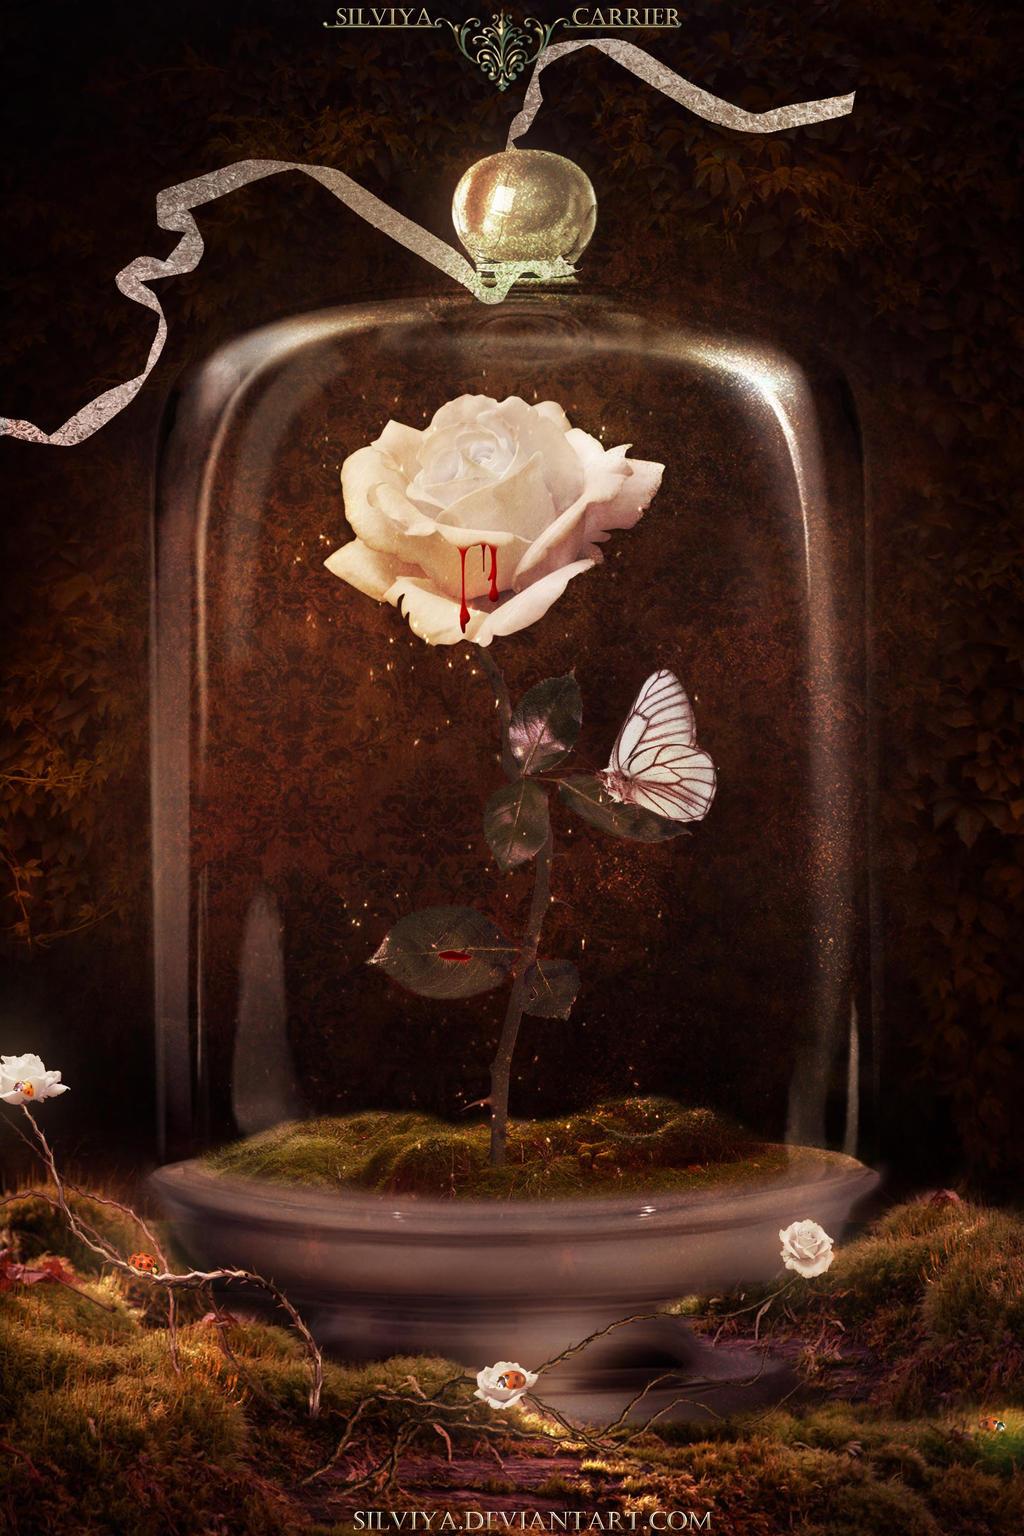 Bleeding Rose by silviya